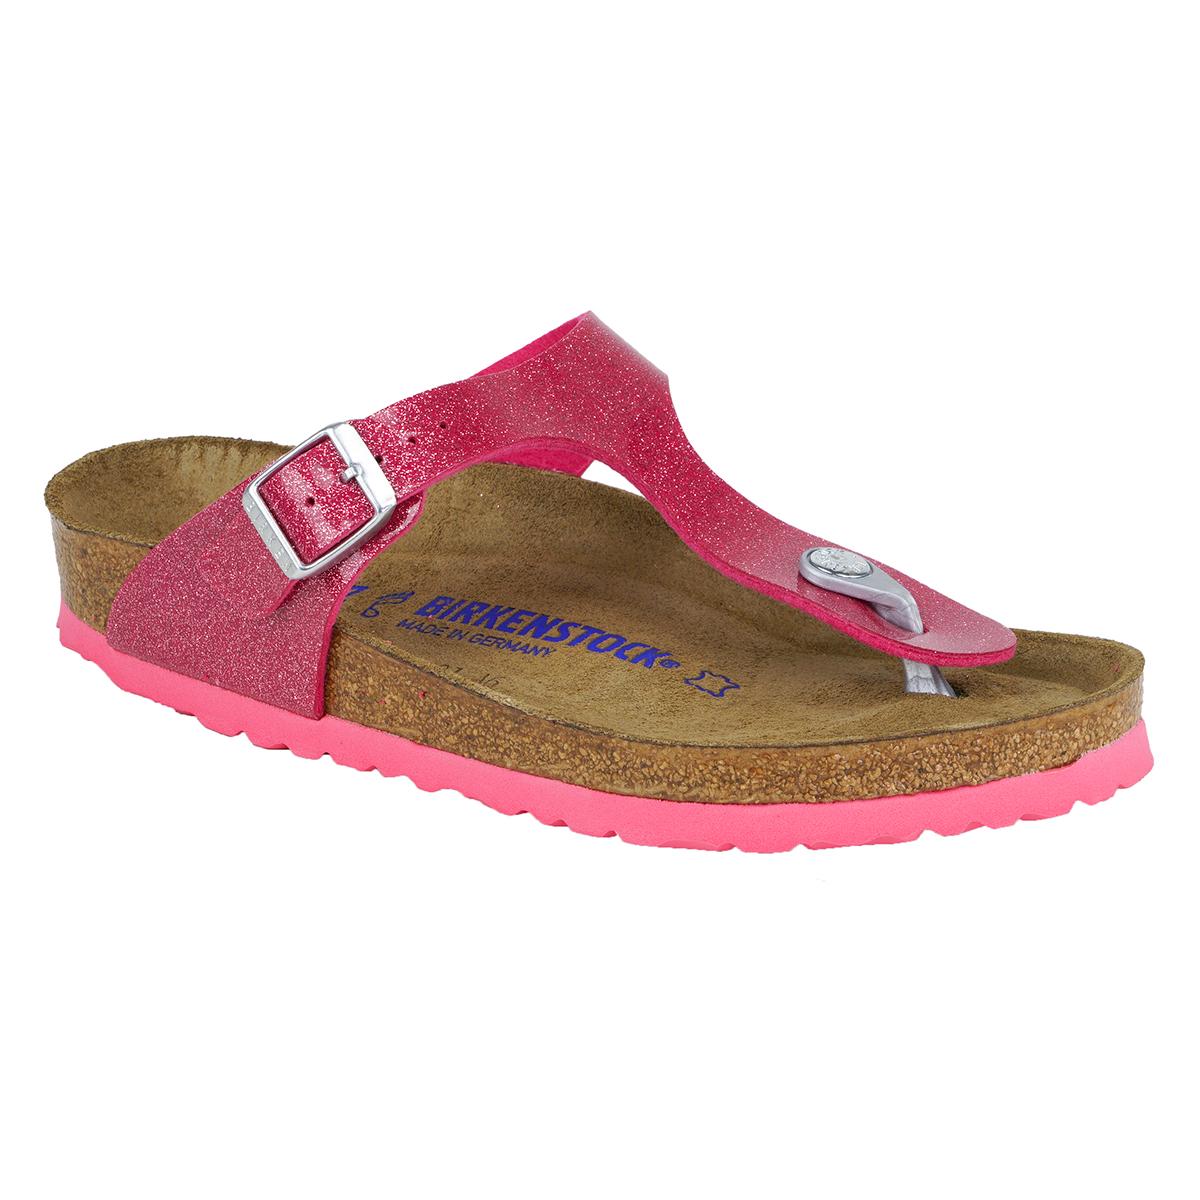 105855f1582 Birkenstock Gizeh Soft Footbed Birko-Flor Sandals Magic Galaxy Bright Rose  37